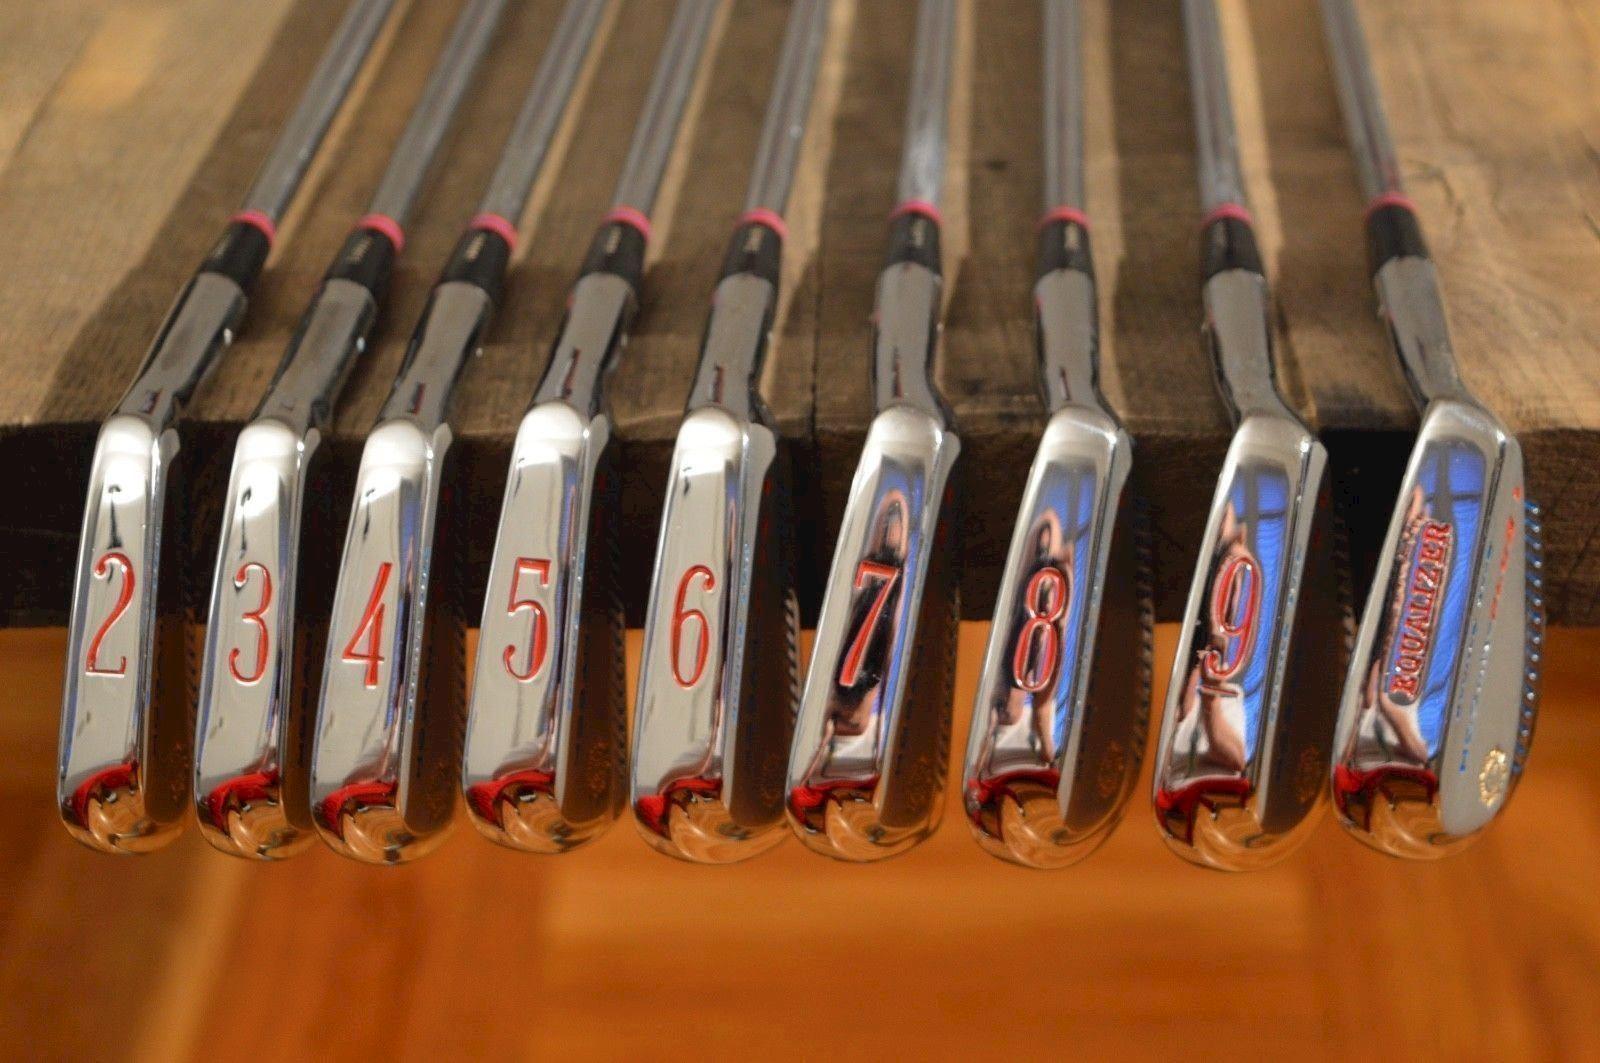 Ben Hogan Golf Iron Set - 1968 Bounce Sole HOGAN-PLUS 1 Vintage 1 ...